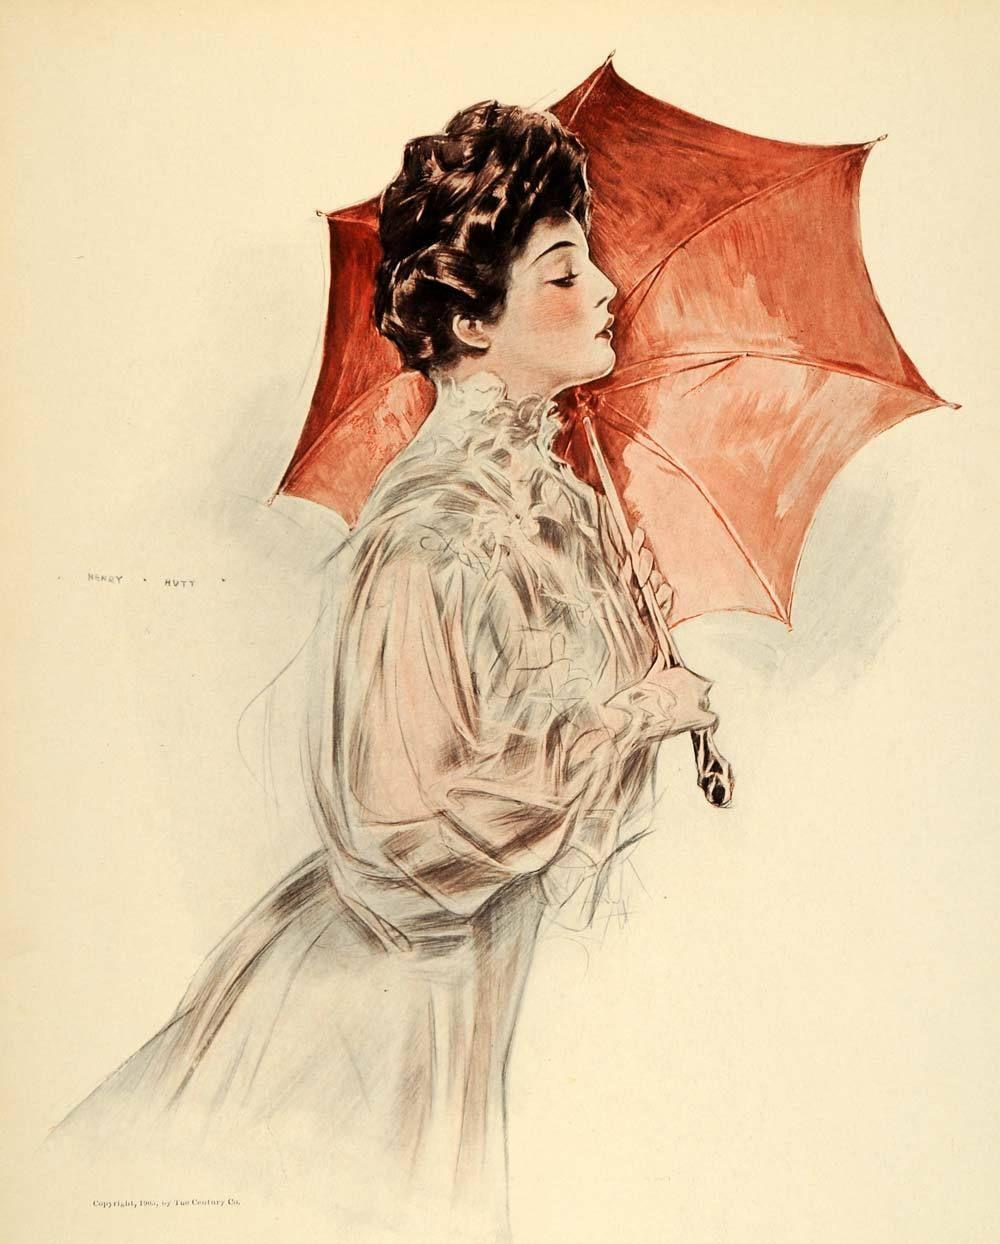 1908 Henry Hutt Victorian Lady Parasol Umbrella Print Original | eBay